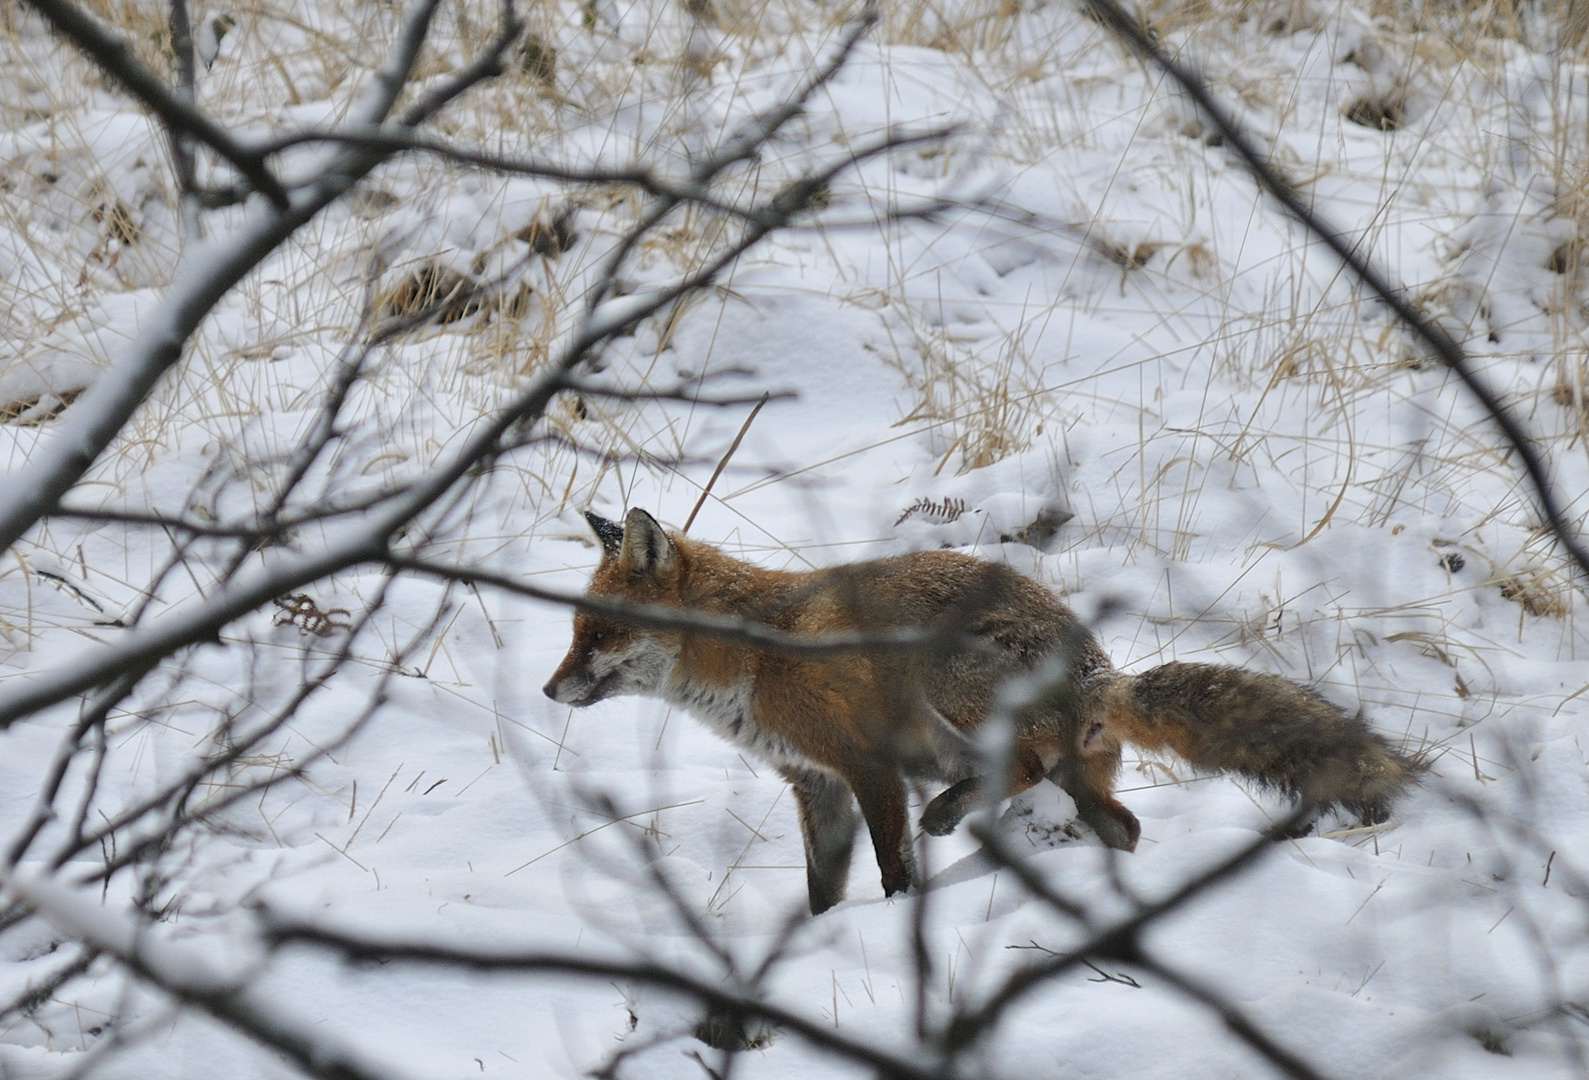 Maître renard marque son territoire